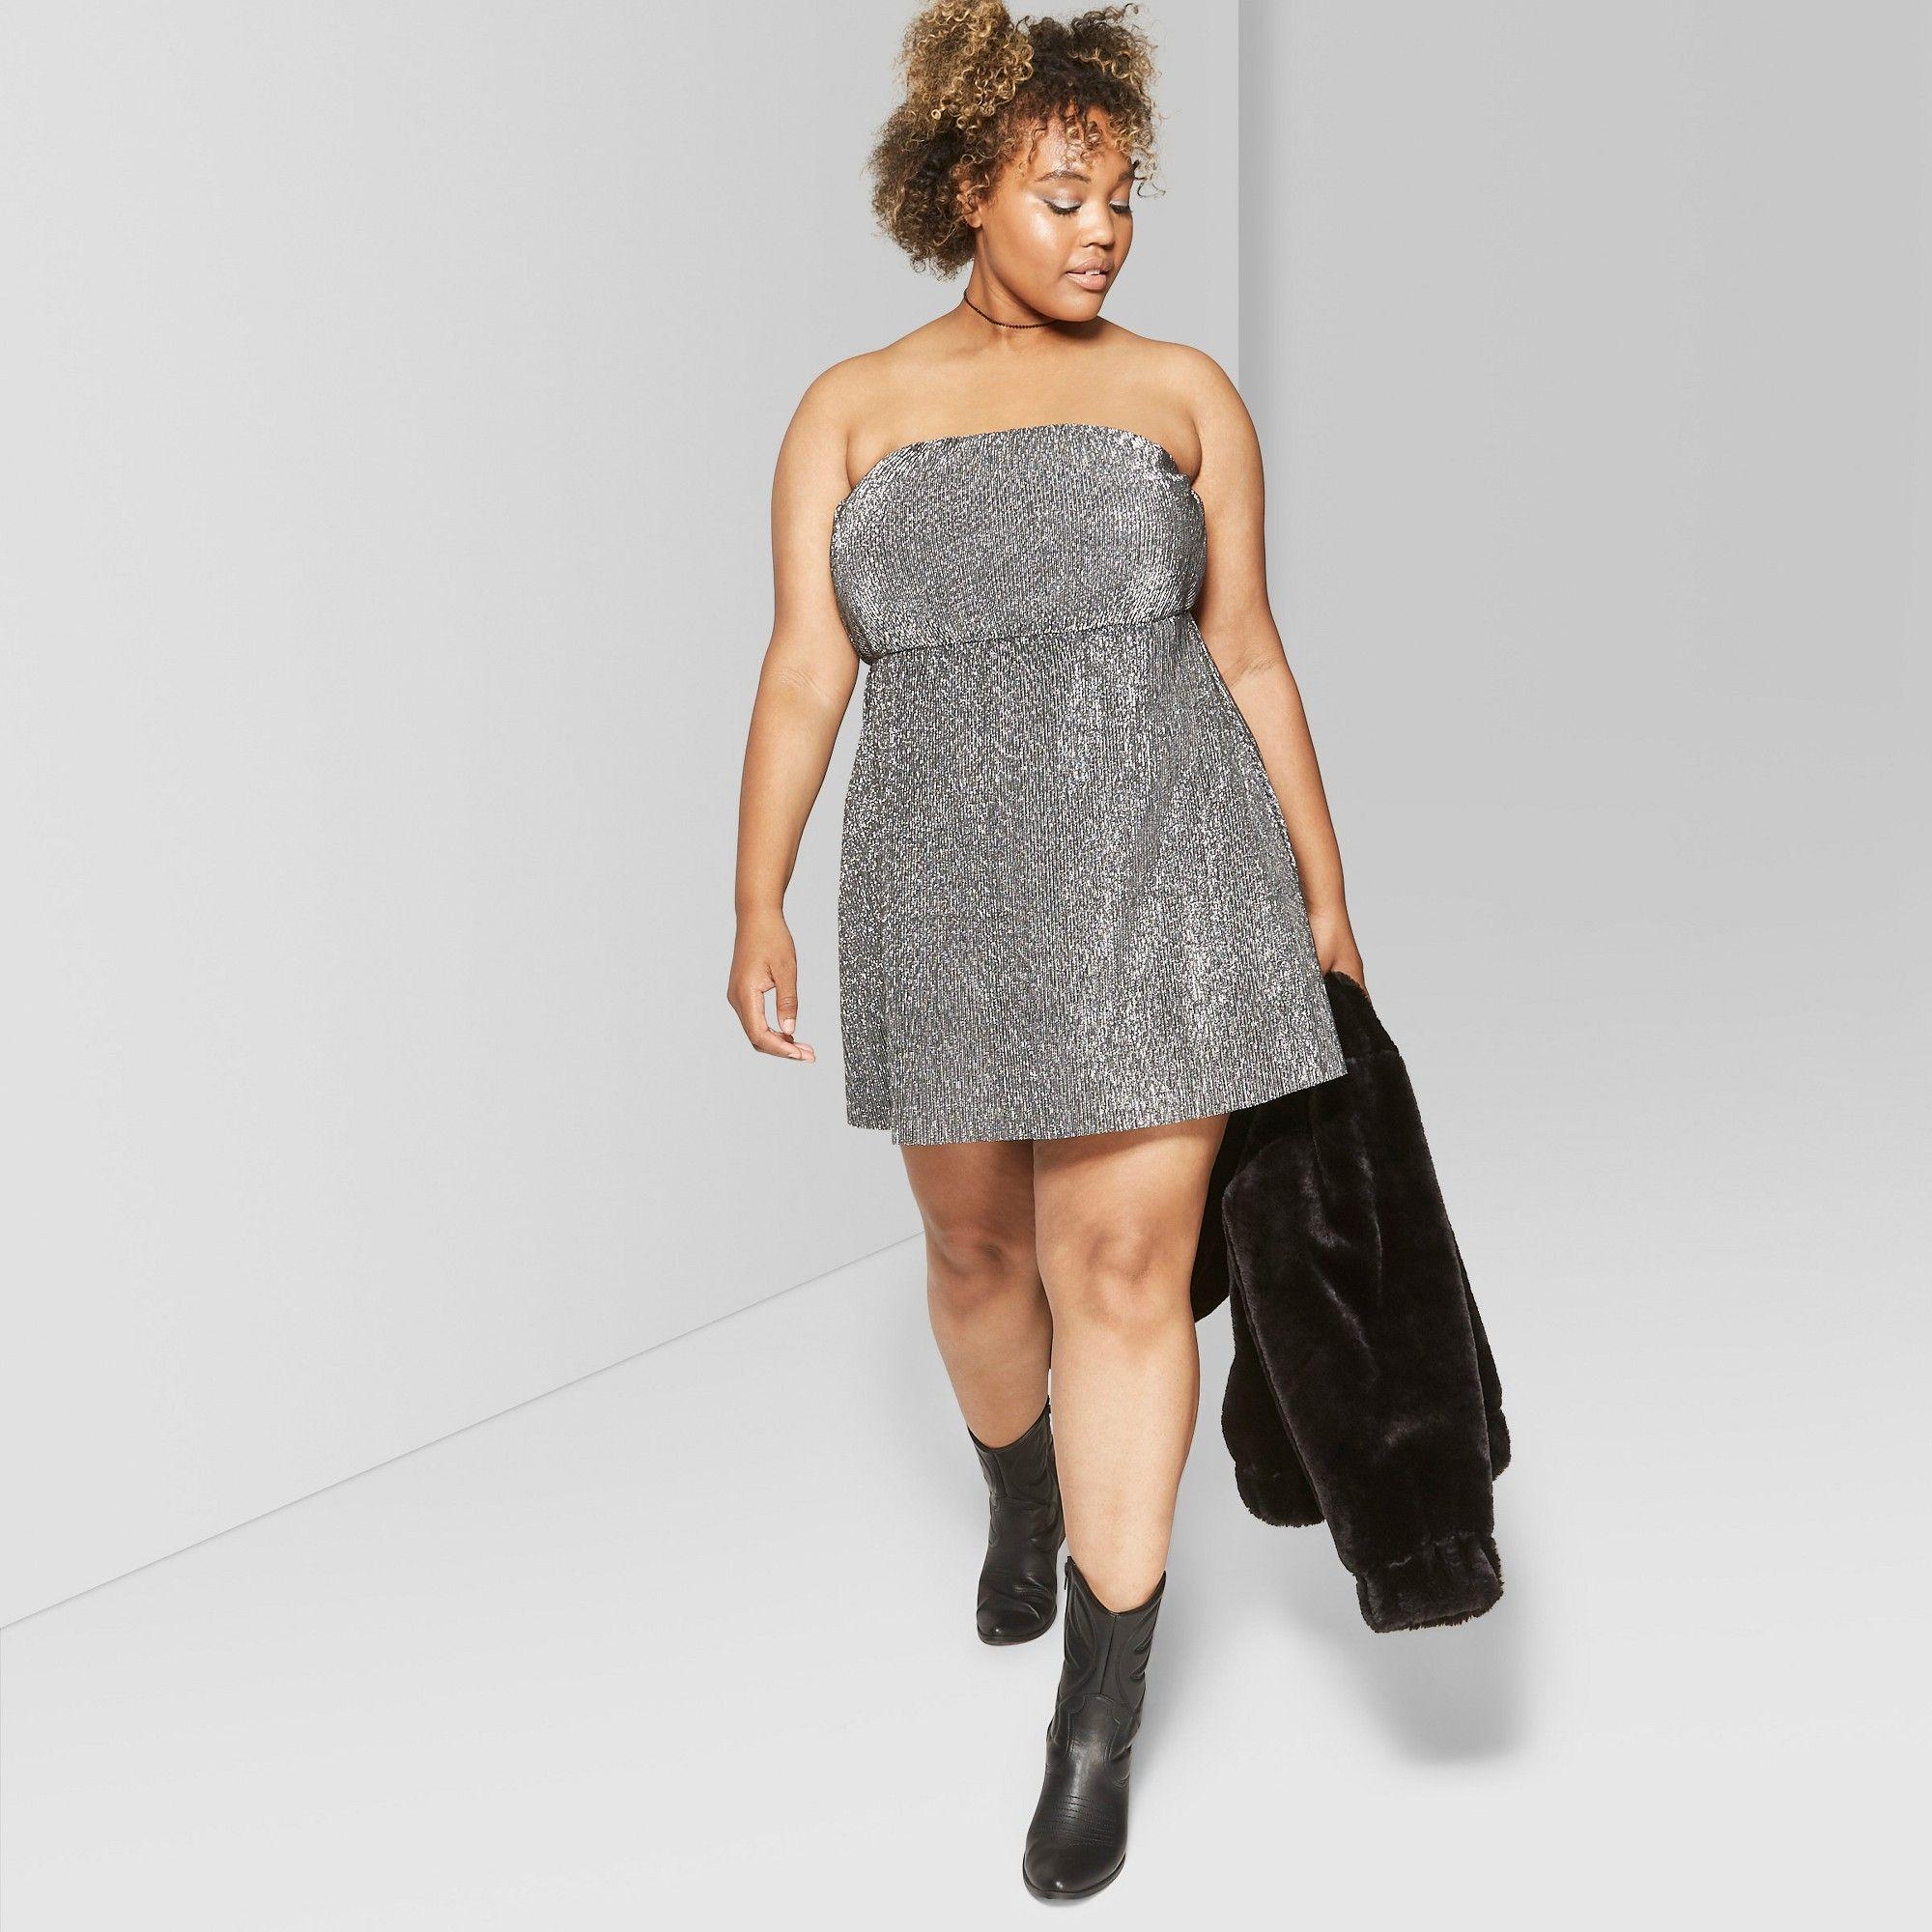 0ce895c7634 Women's Plus Size Strapless Knit Metallic Bodre Dress - Wild Fable ...